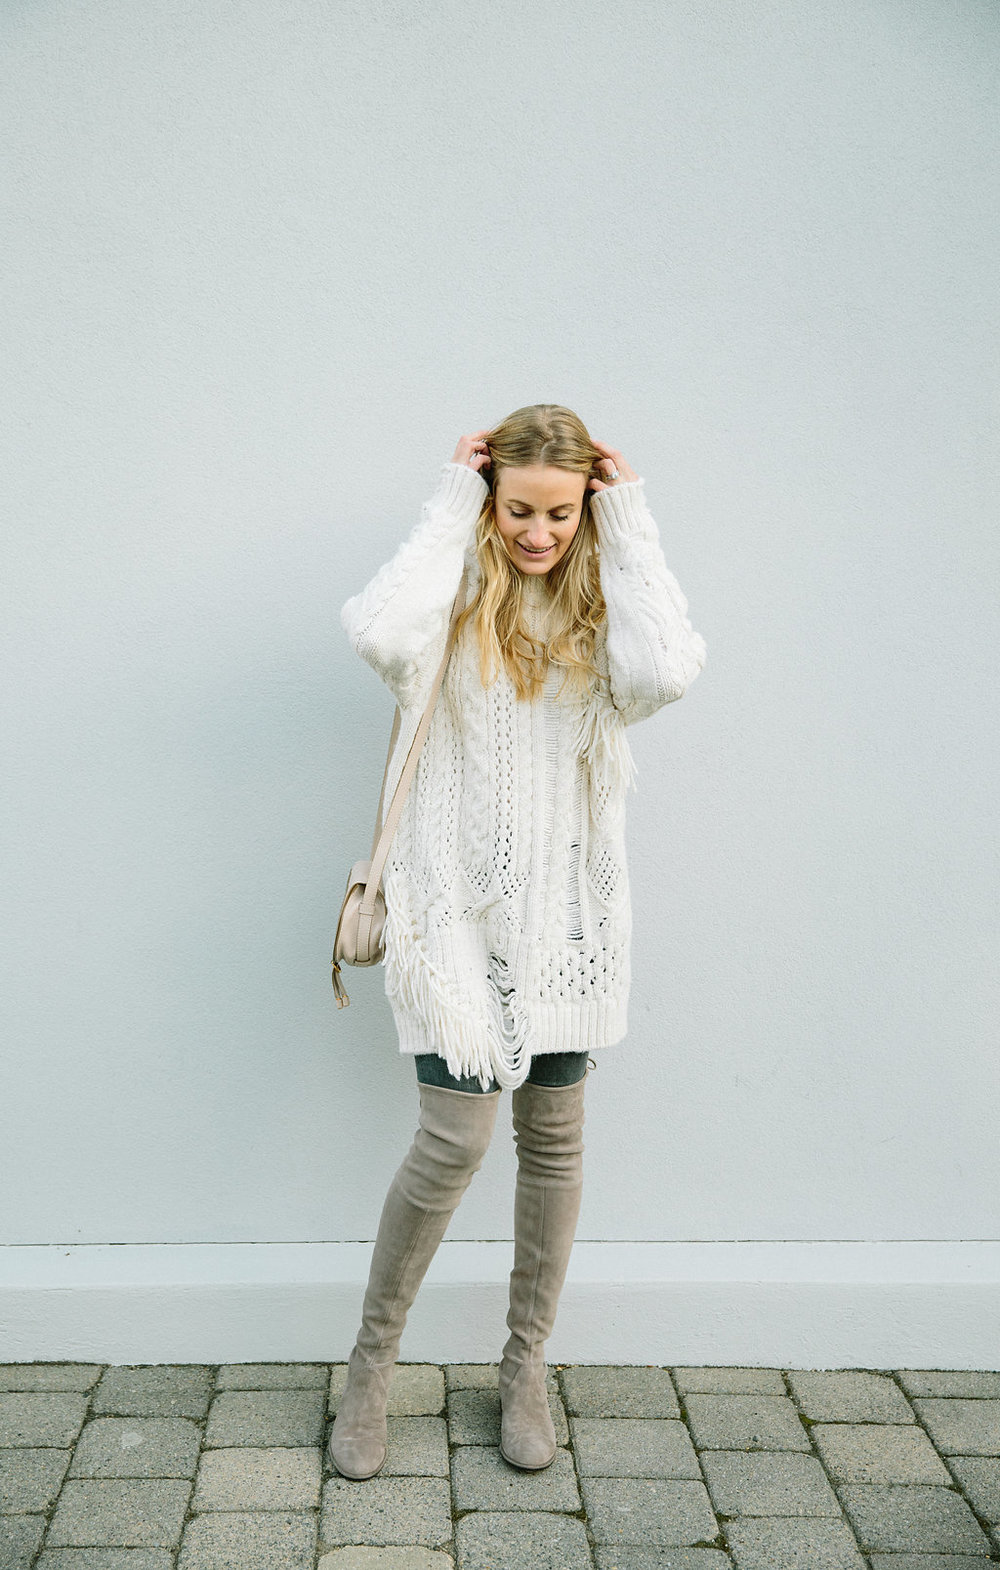 TheGirlGuide-StephanieTrotta-LindsayMaddenPhotography-16.jpg